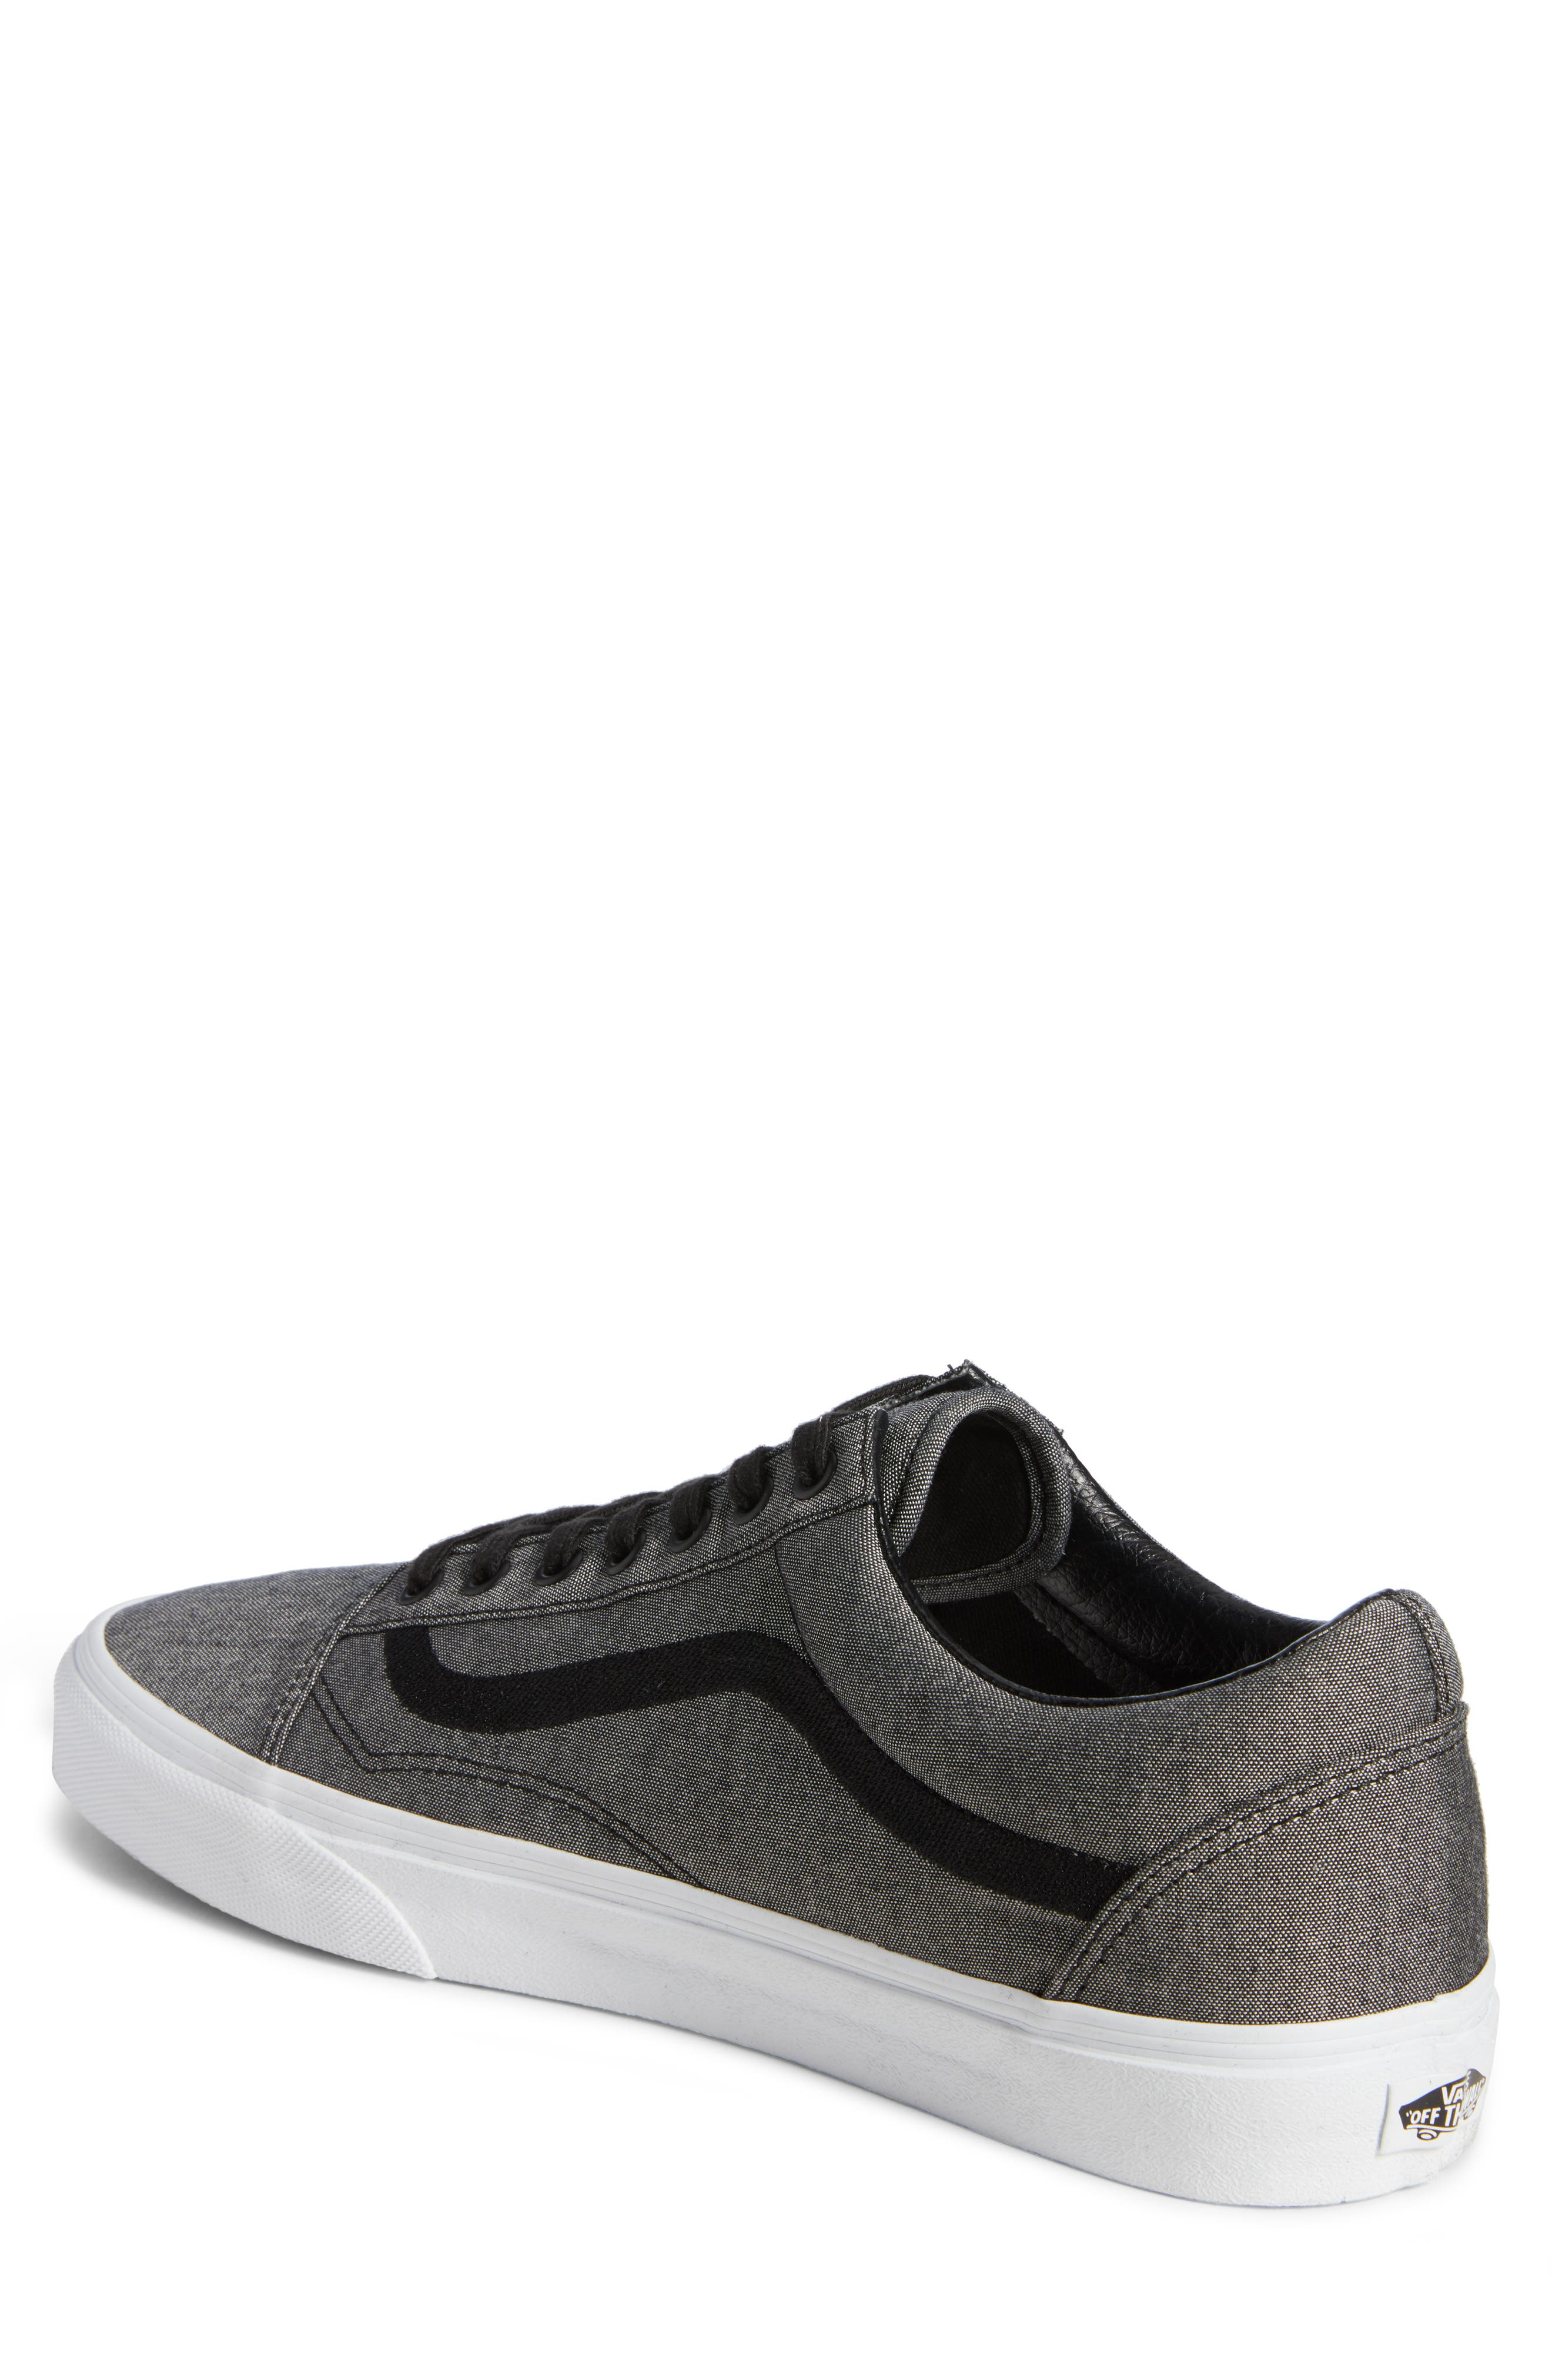 Old Skool Sneaker,                             Alternate thumbnail 2, color,                             Black/ True White/ Grey